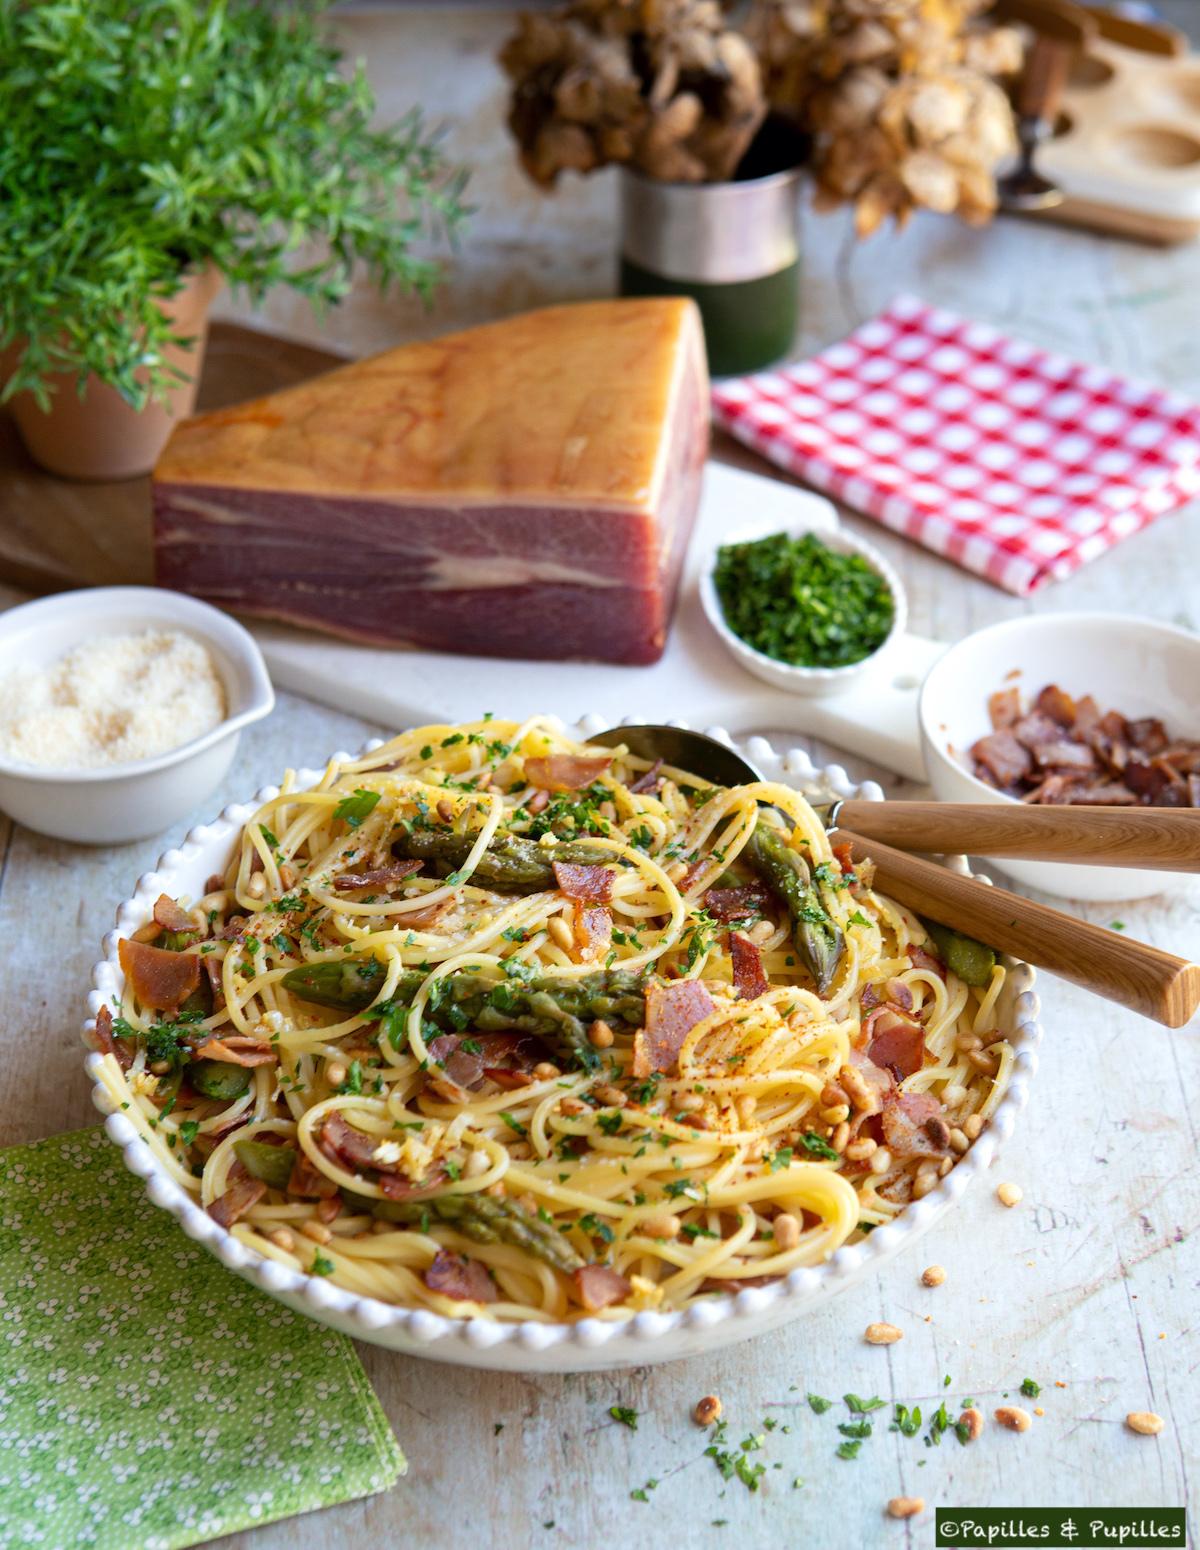 Spaghetti au jambon de Bayonne asperges vertes